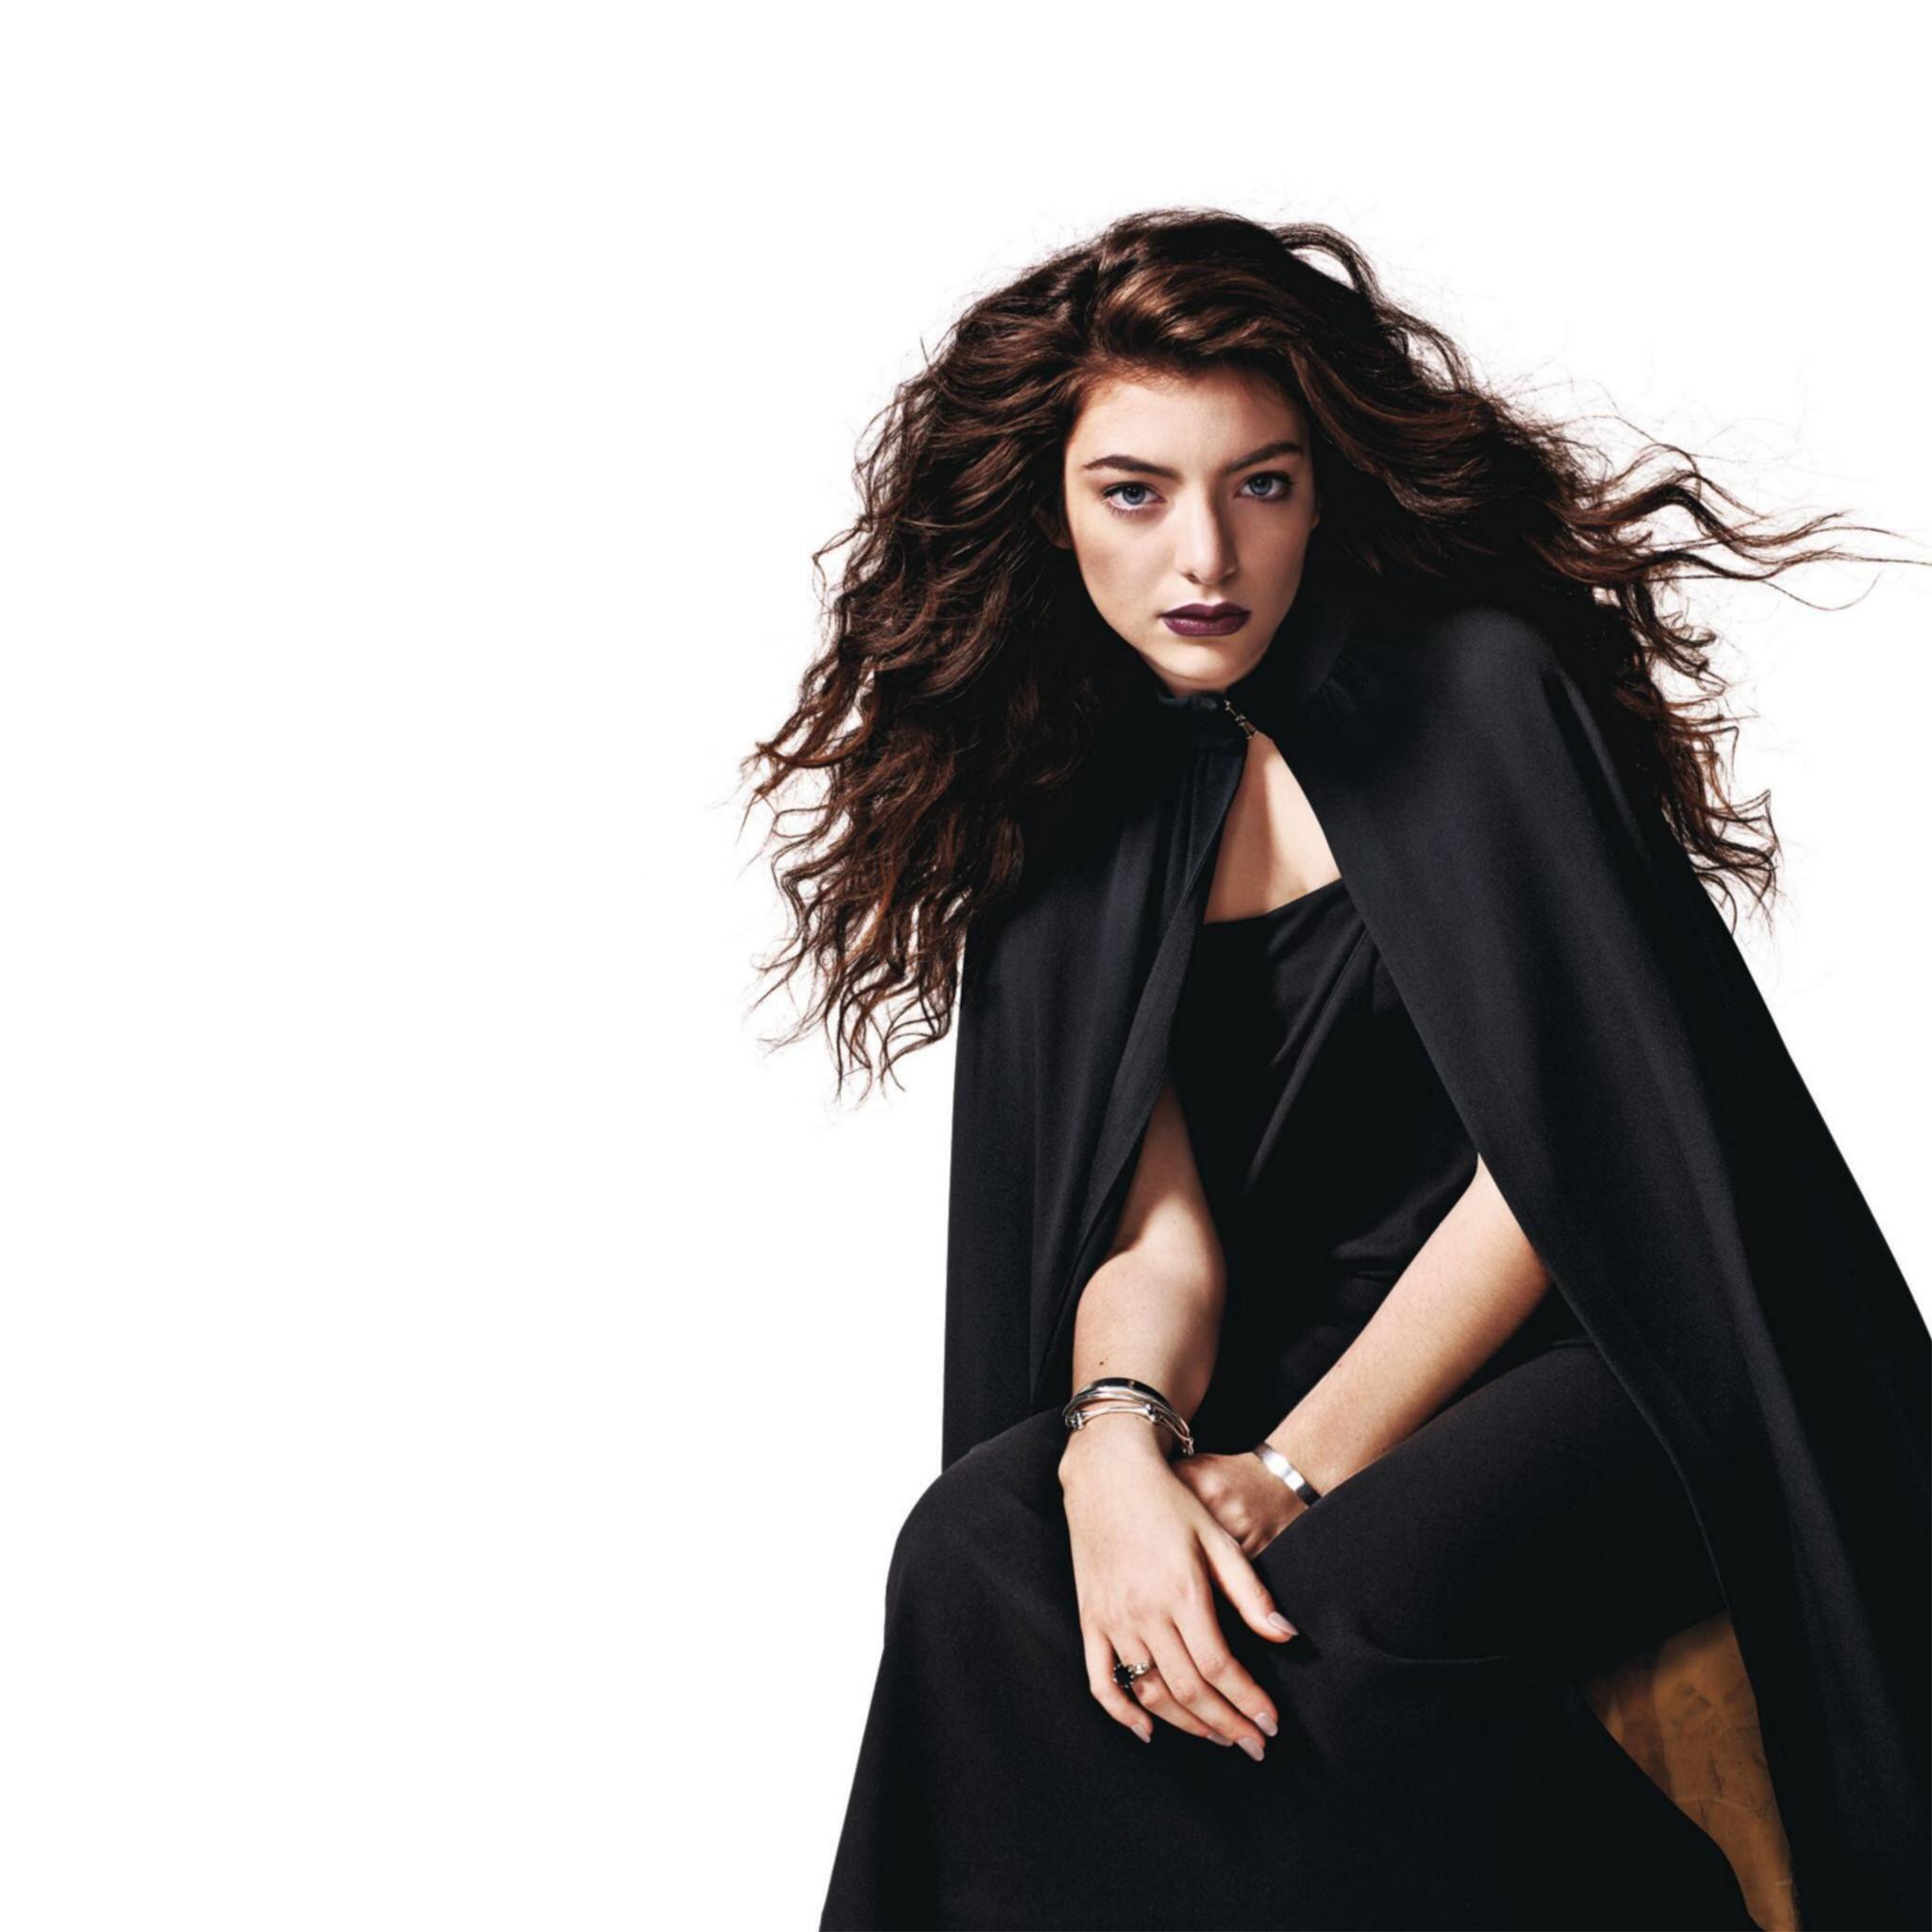 10 Fakta Keren Lorde yang Bikin Kamu Wajib Nonton Penampilannya